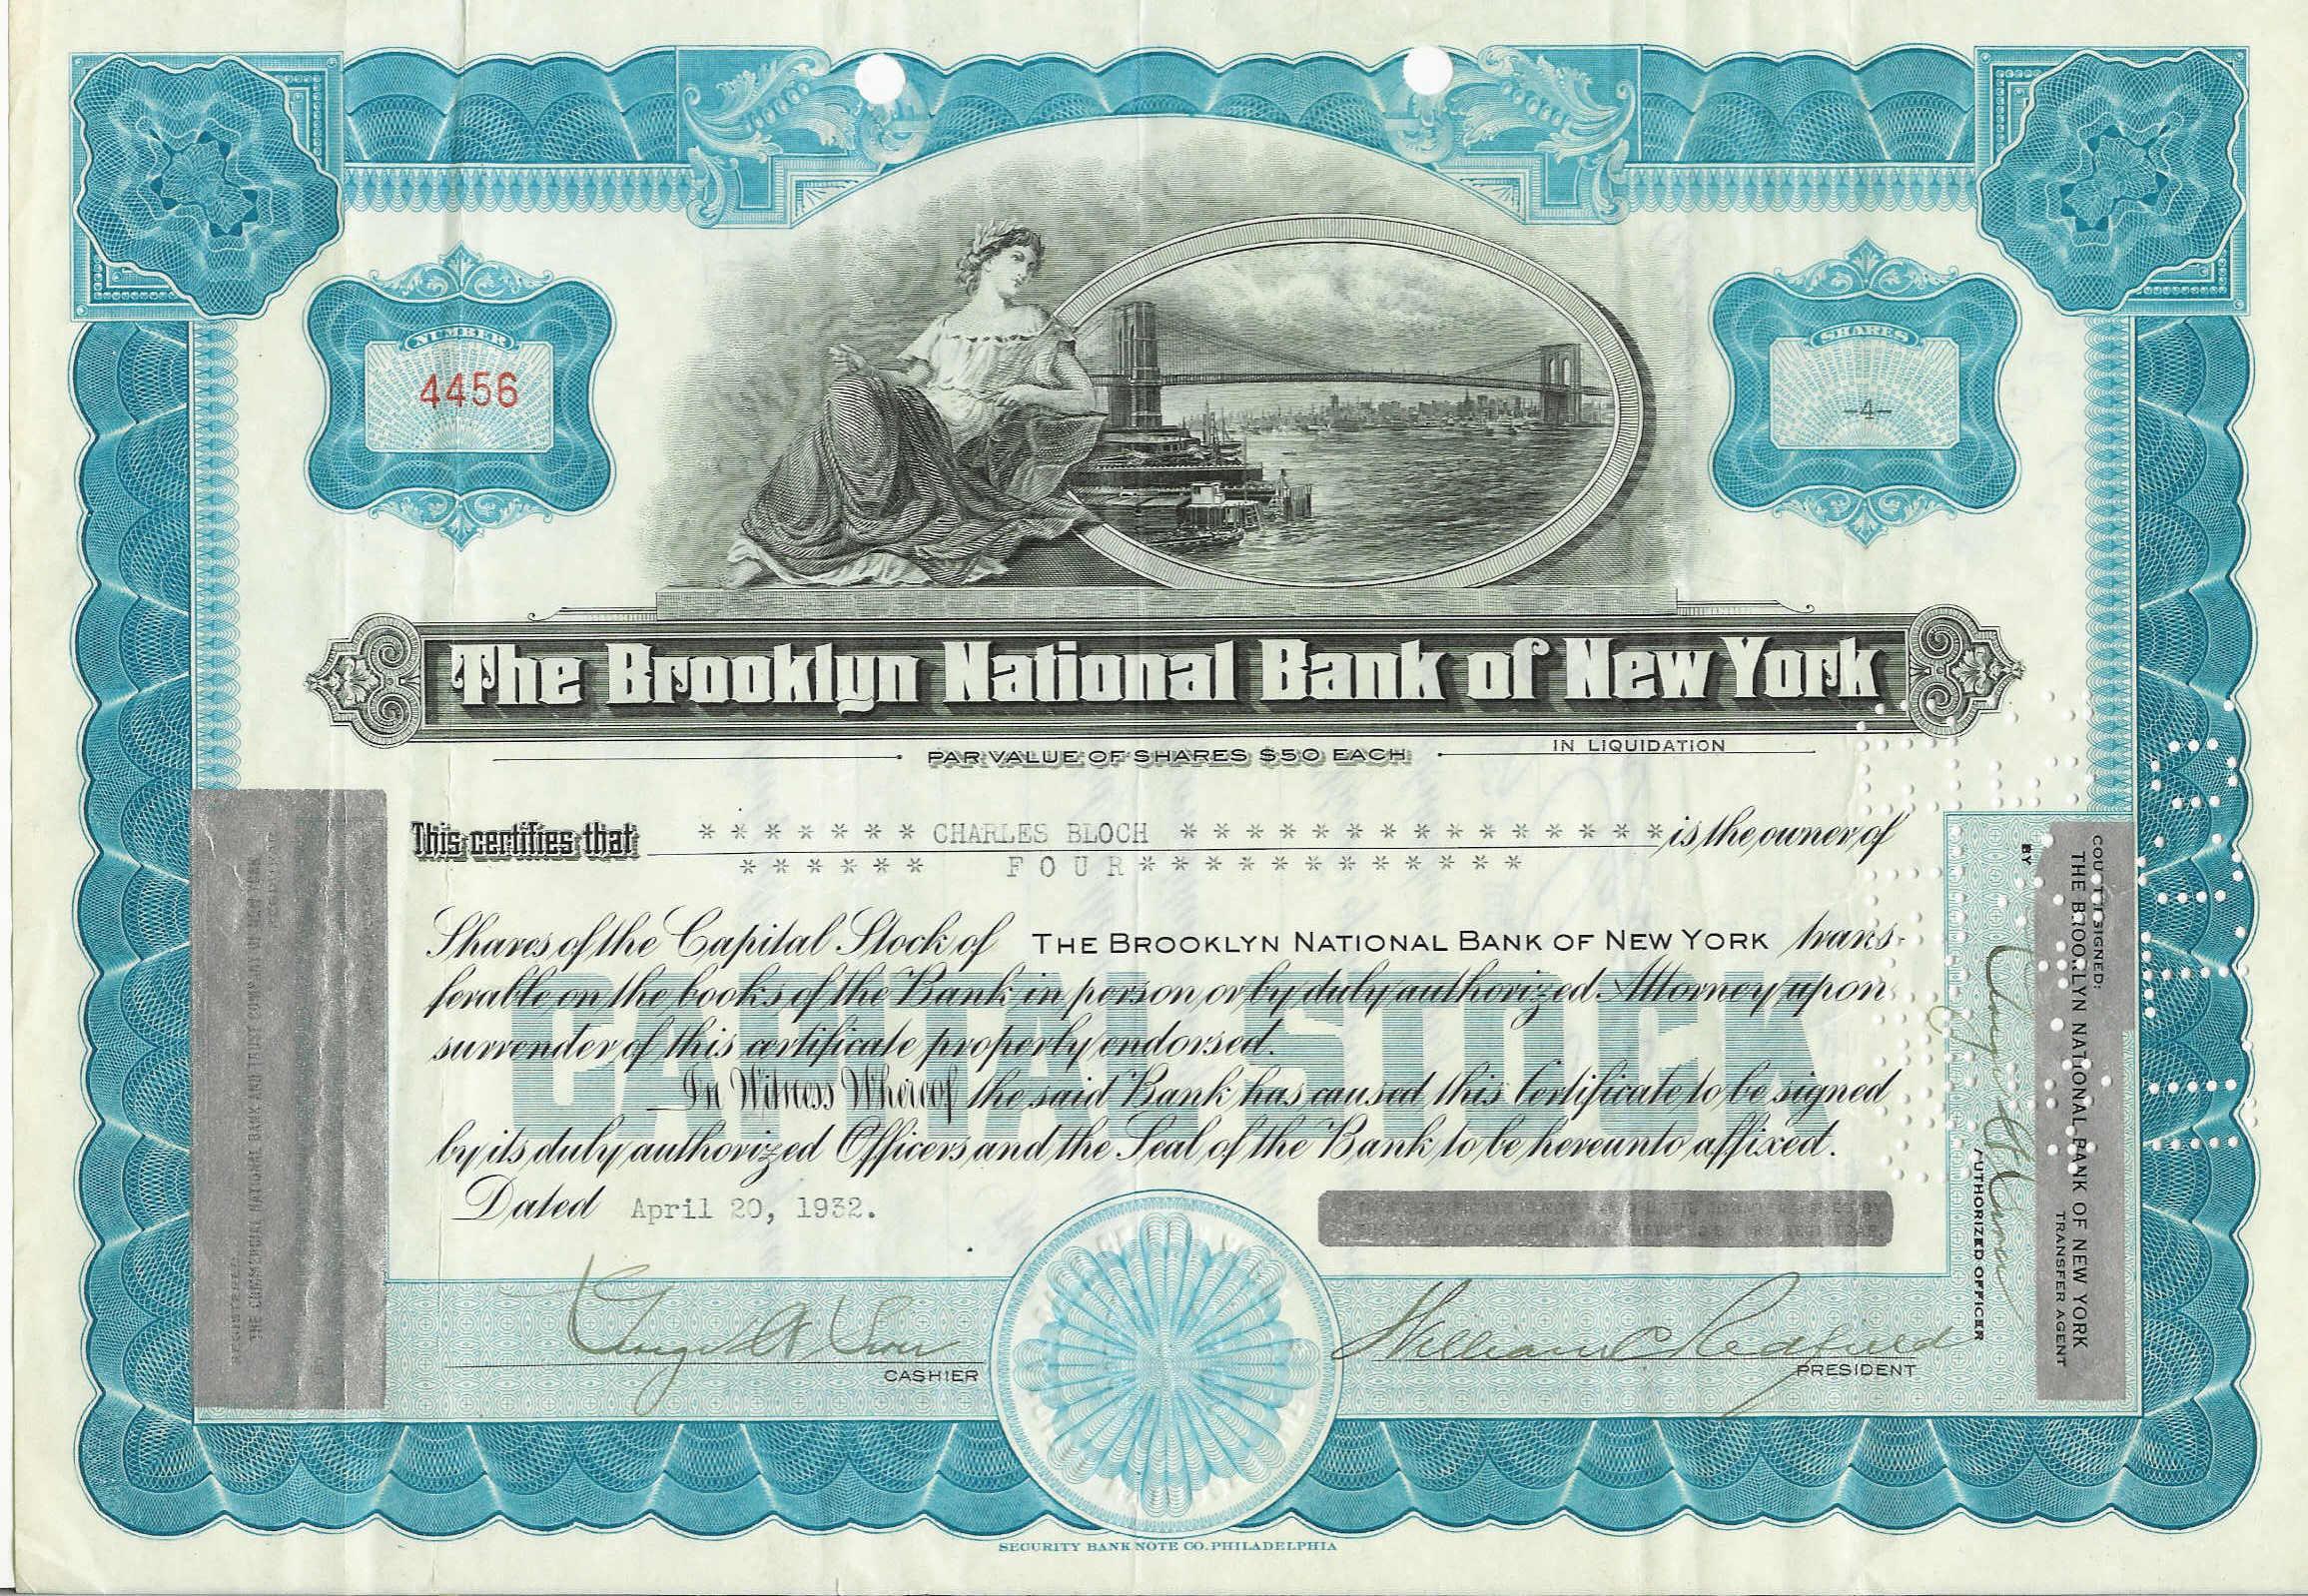 BrooklynNationalBankofNY_200dpi9.jpg